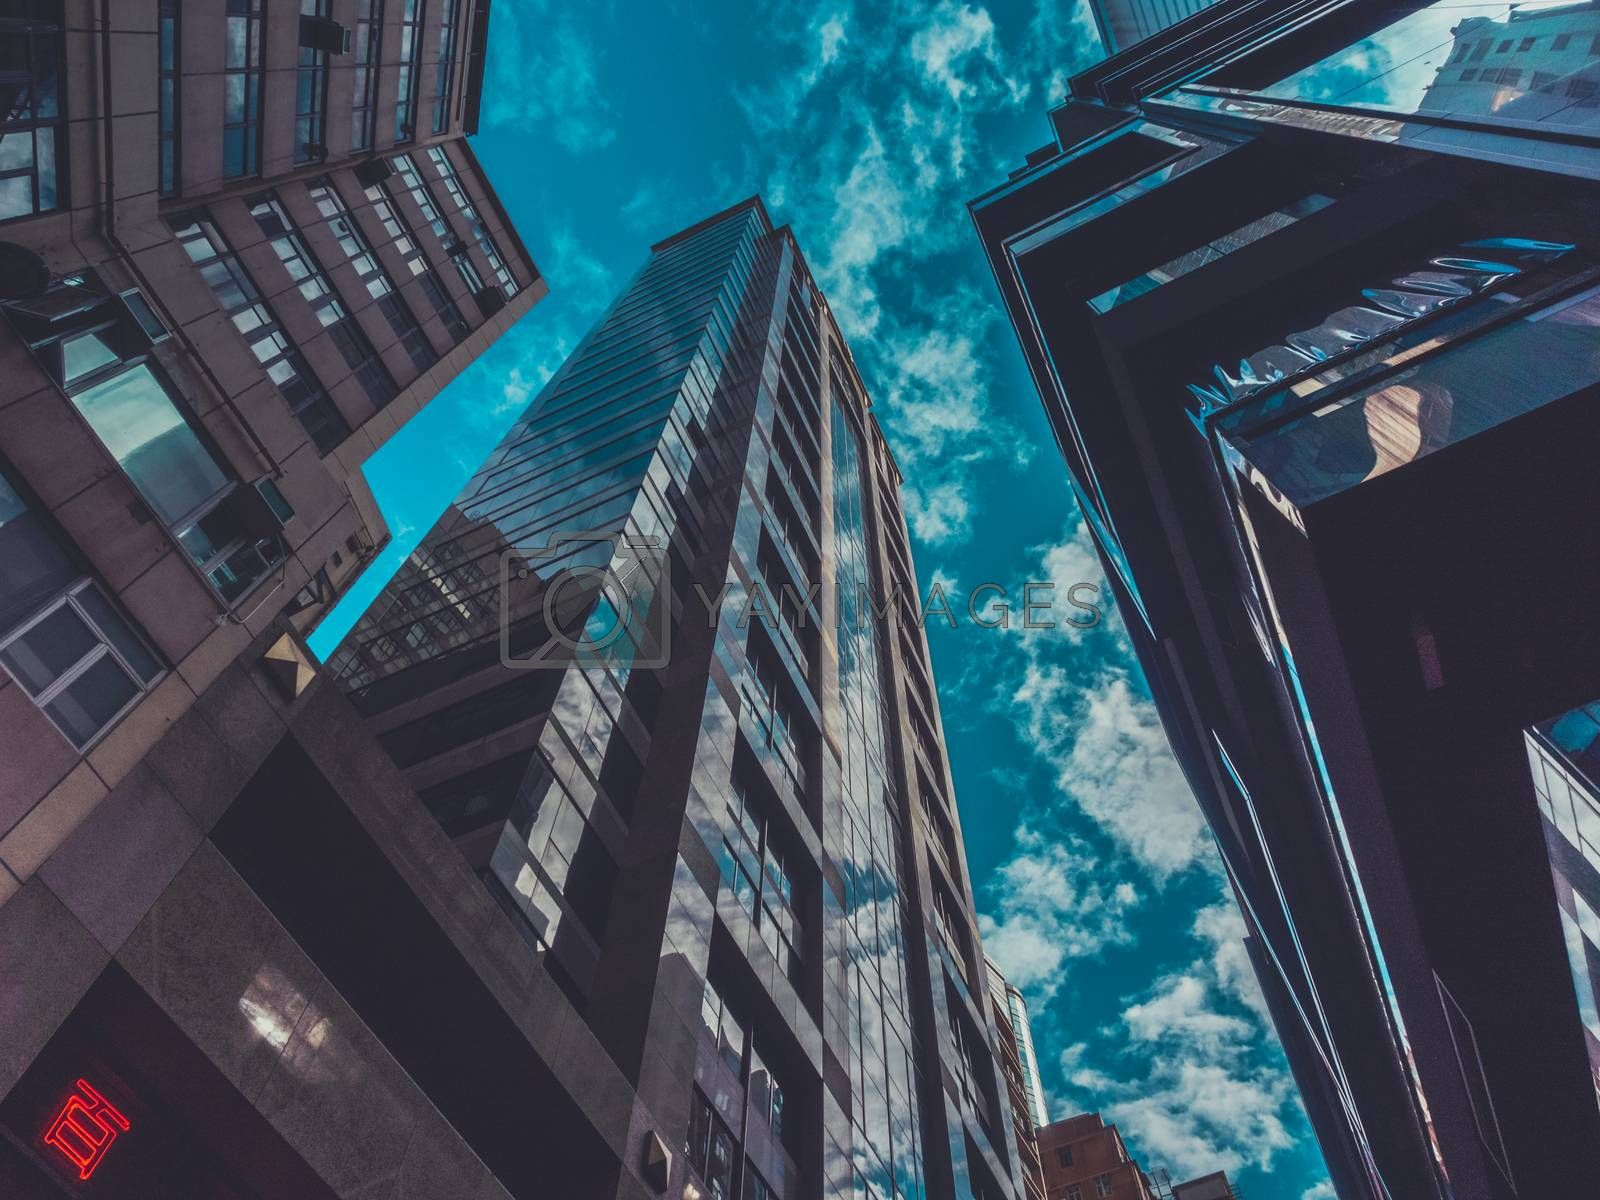 Skyscraper Buildings and Sky View in Big City